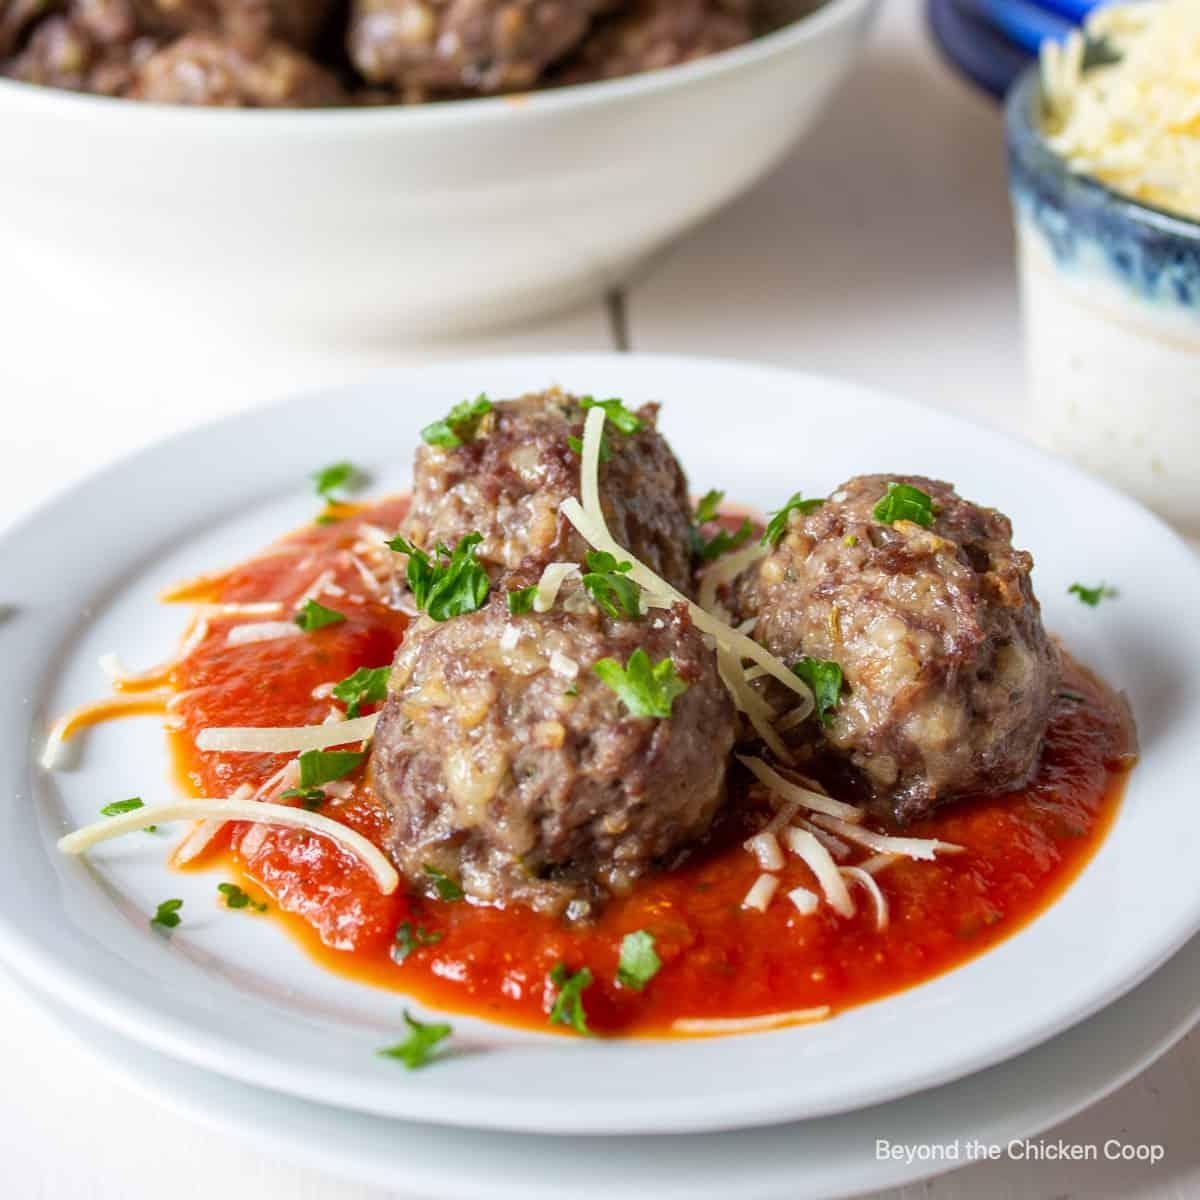 Three meatballs on a plate.